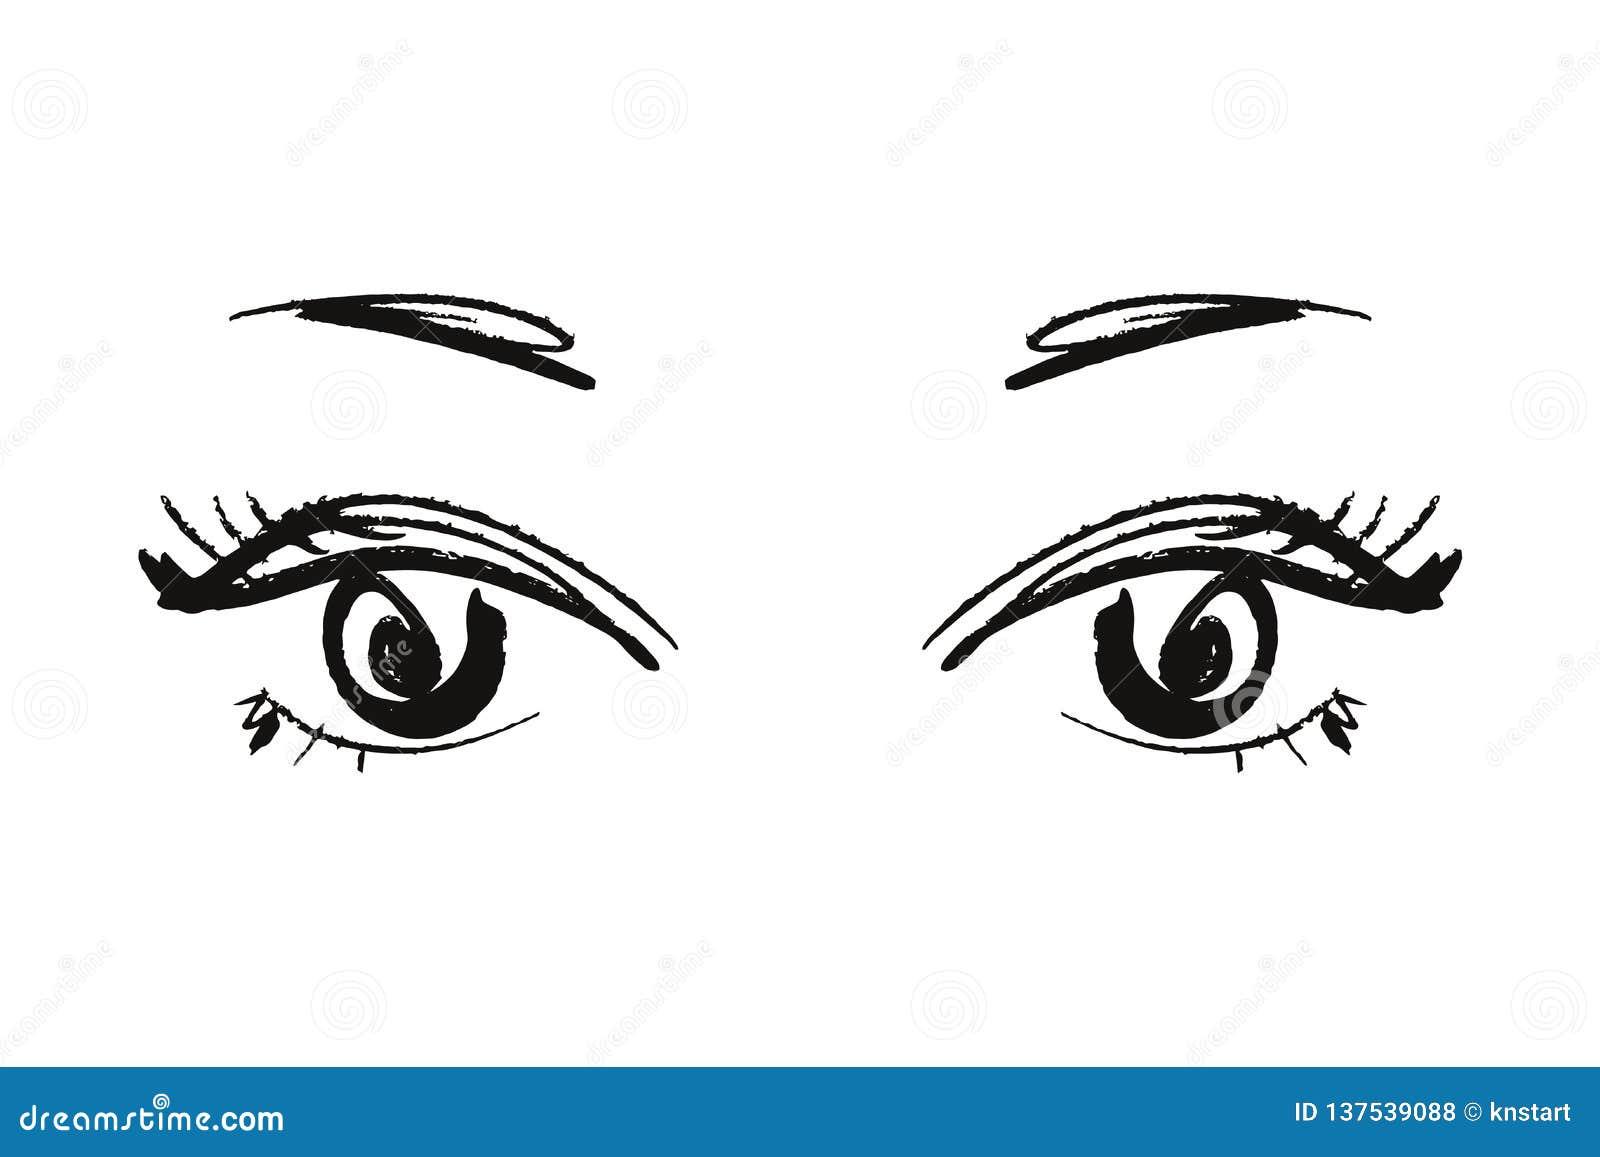 Anime Or Manga Kawaii Eyes Hand Drawn Brush Sketch Eps Illustration